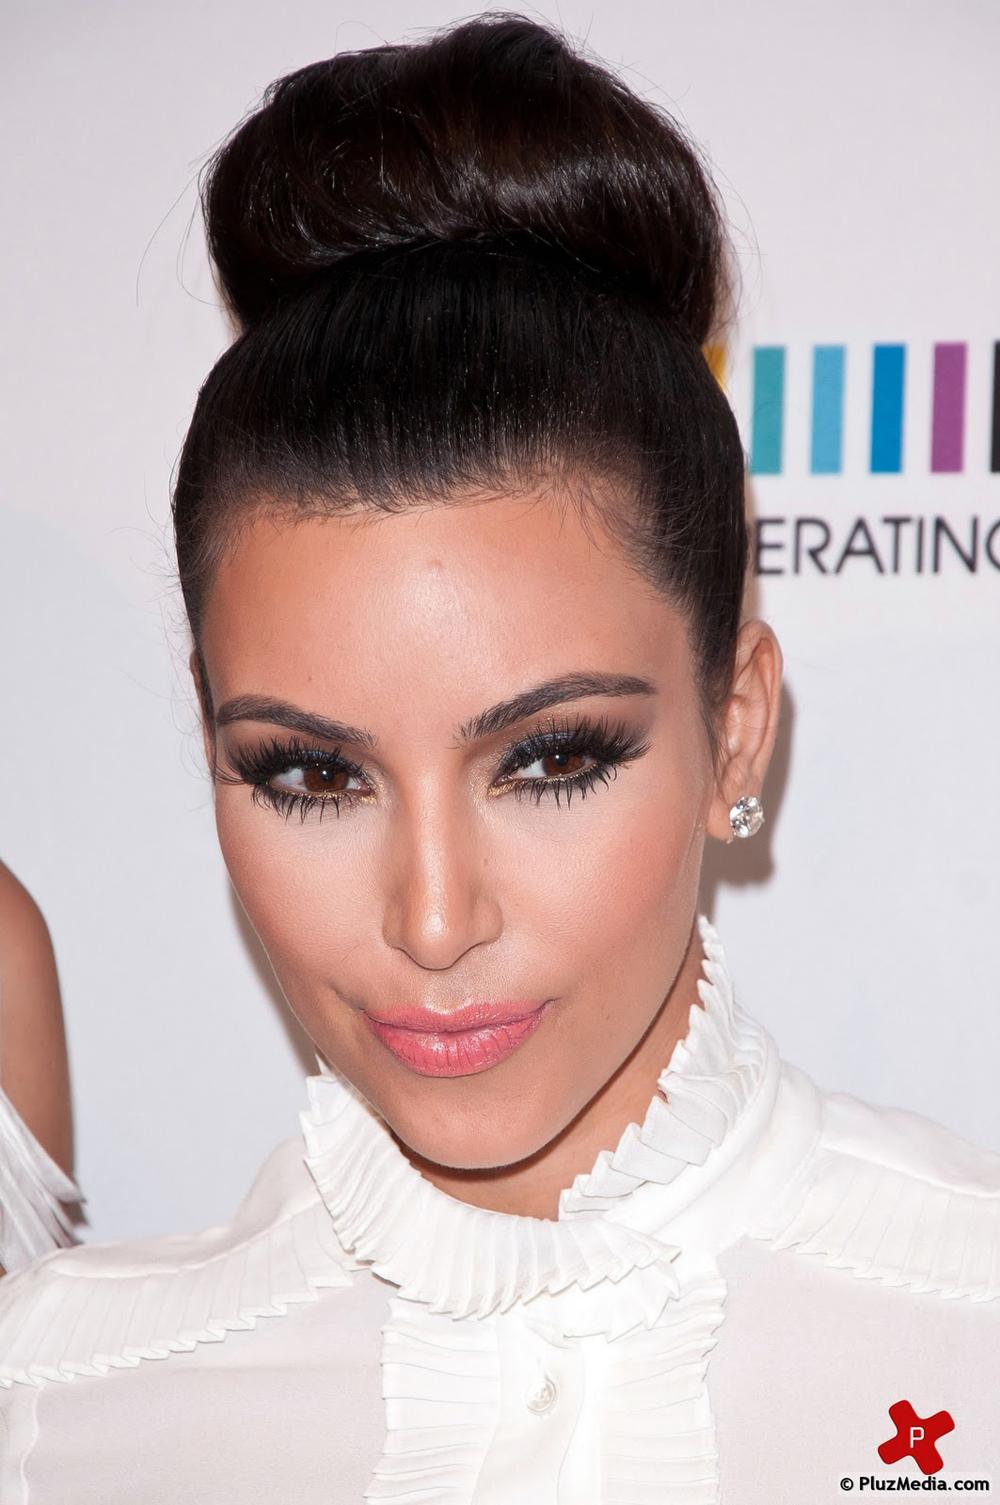 Kim Kardashian Updo Hairstyles | Fresh Look Celebrity Hairstyles